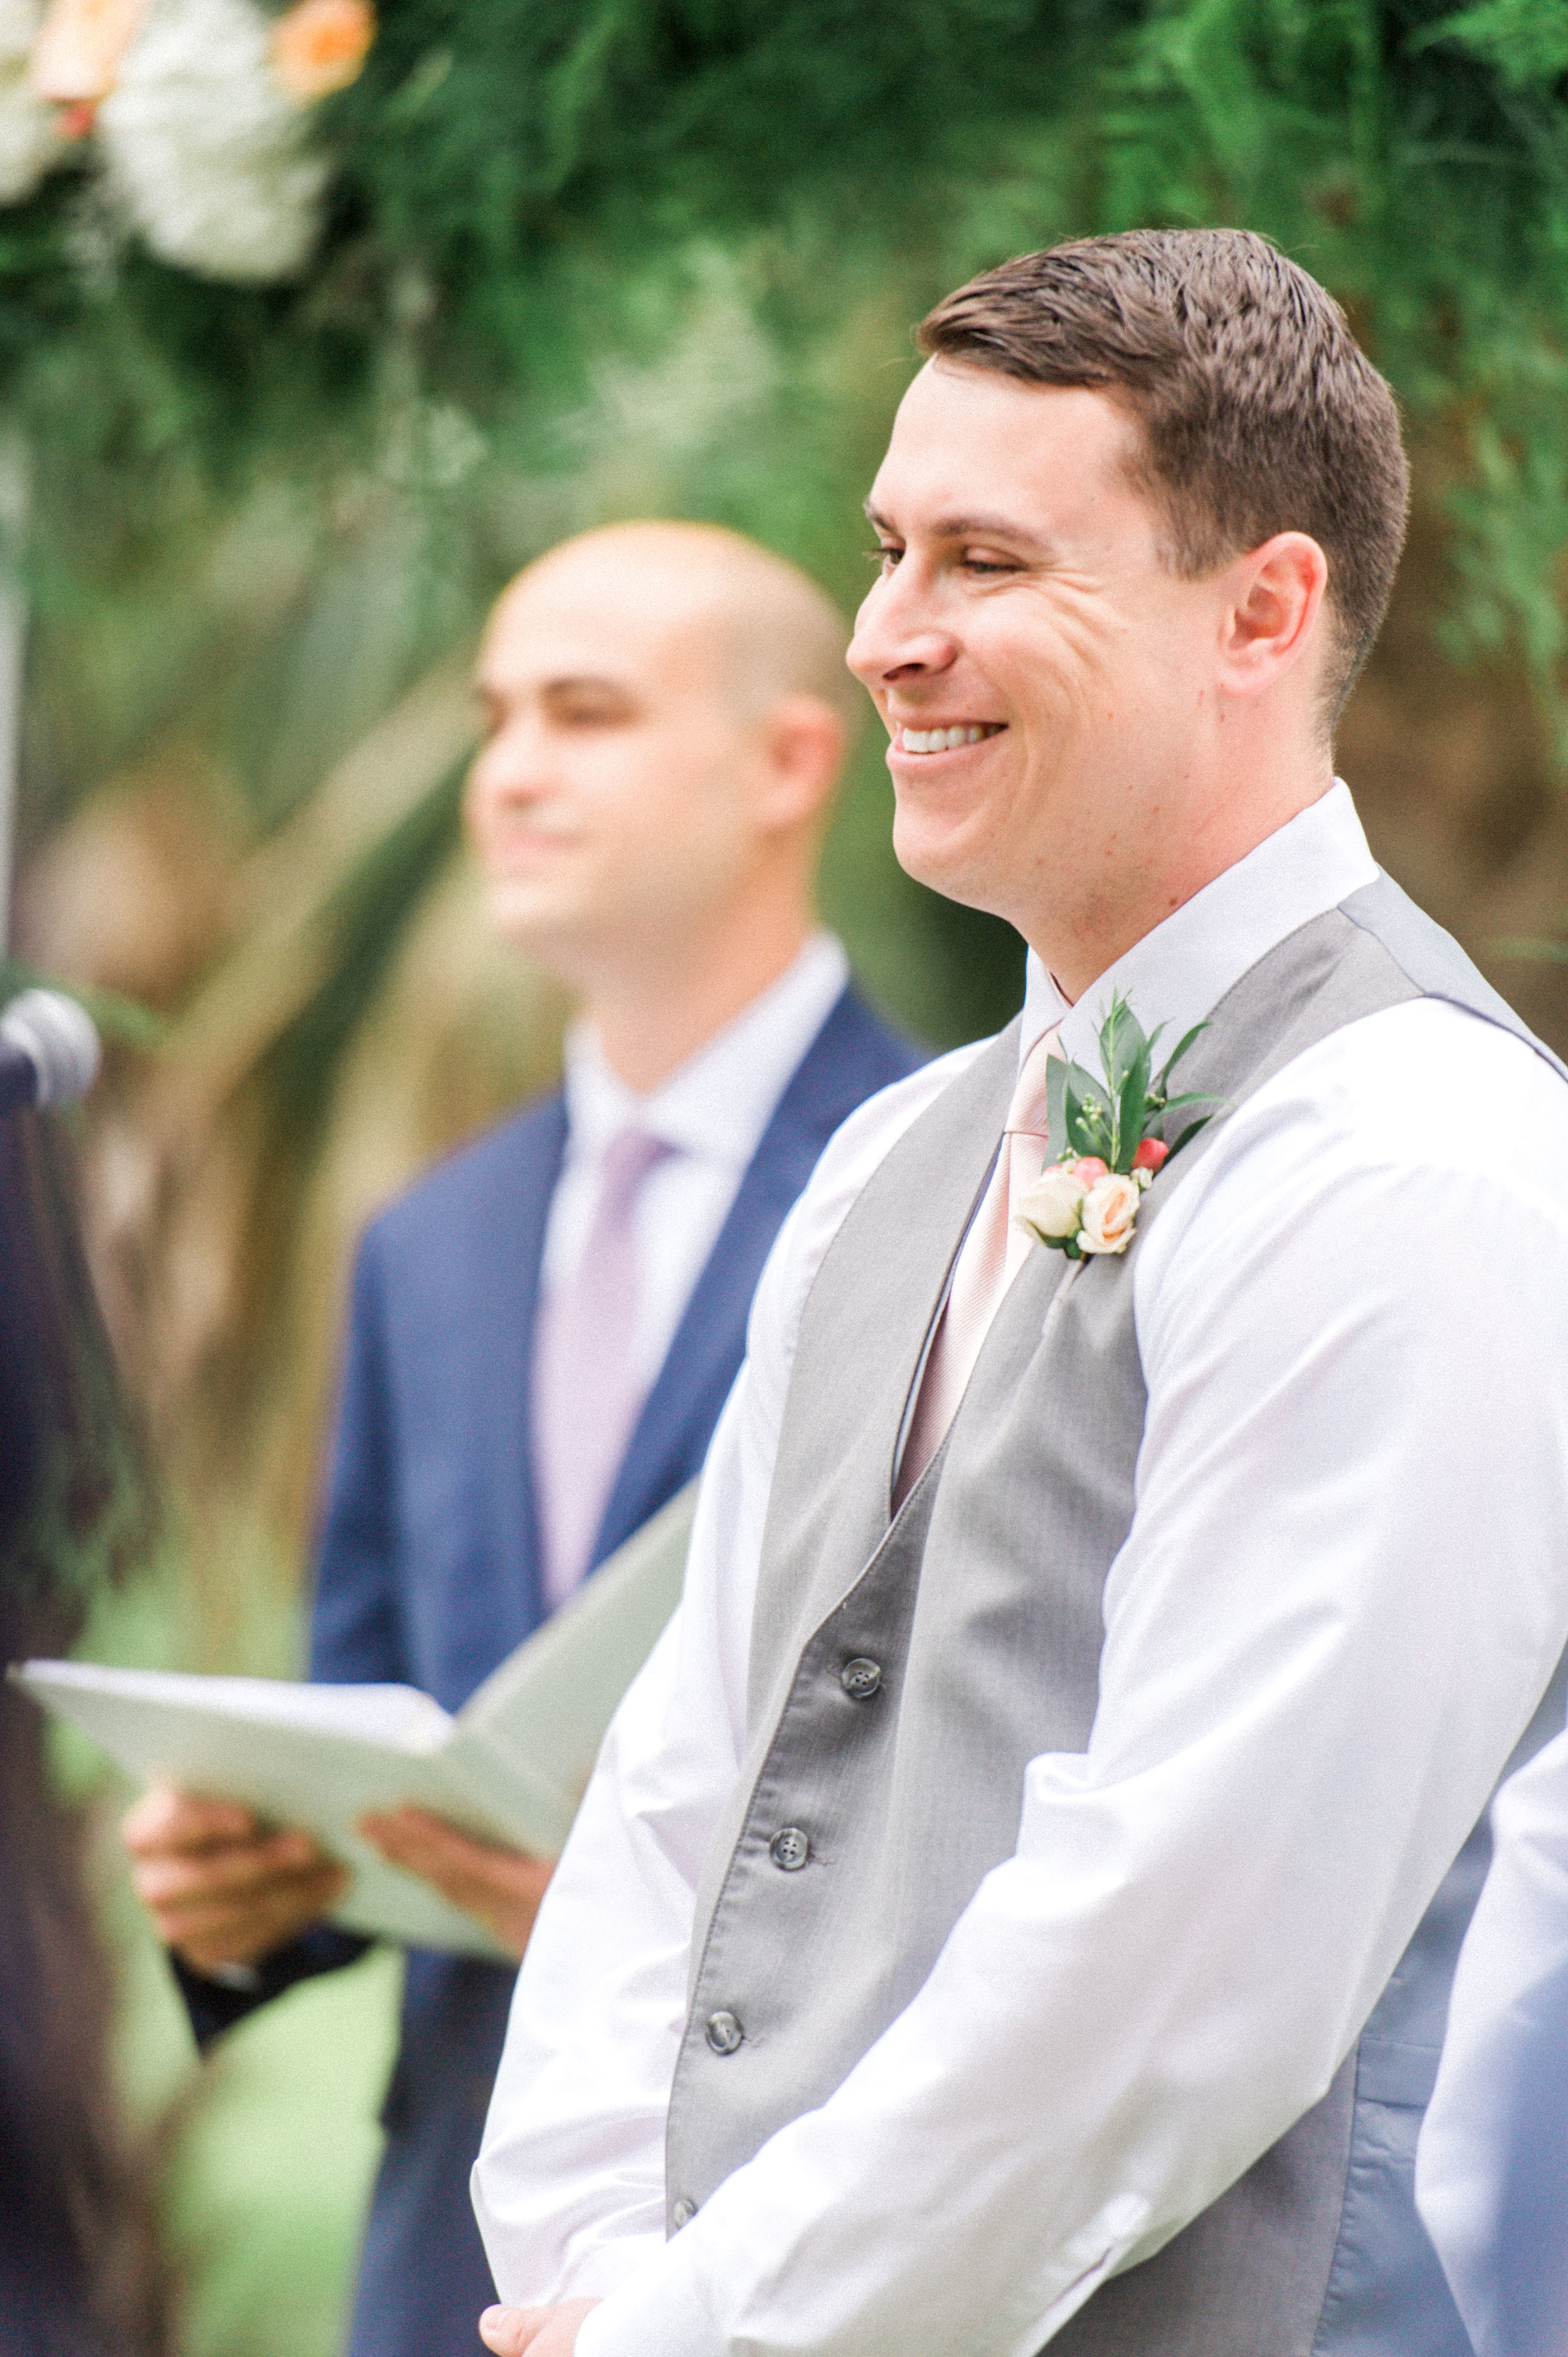 Banyan Estate wedding by Orlando Wedding Photographer